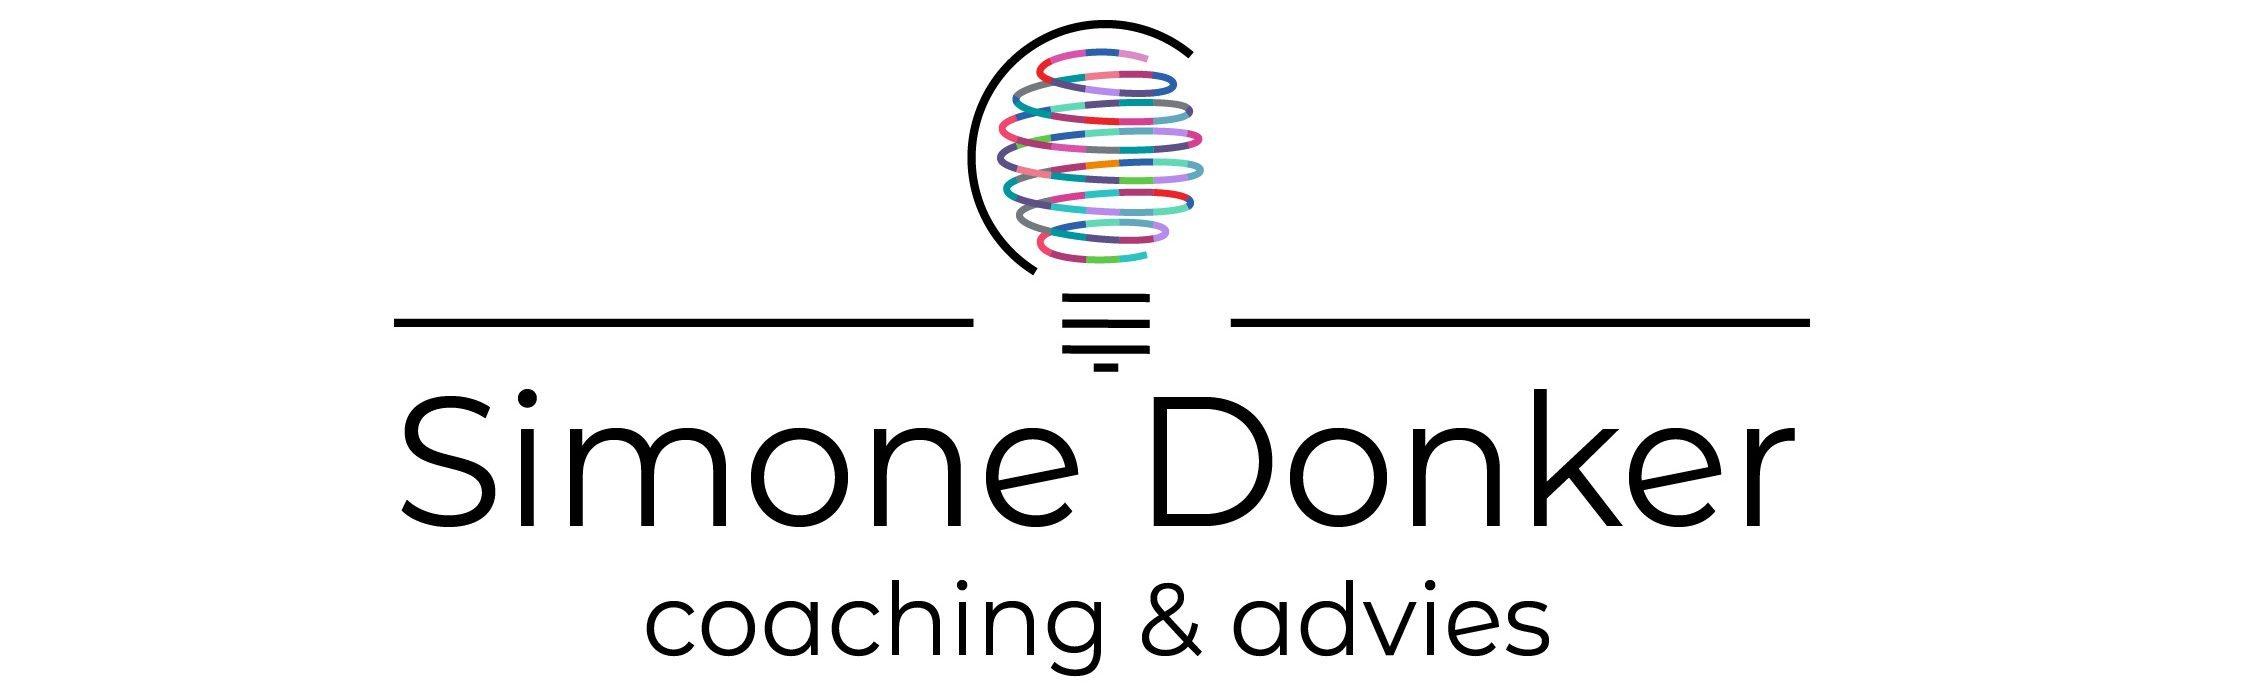 Simone Donker coaching & advies